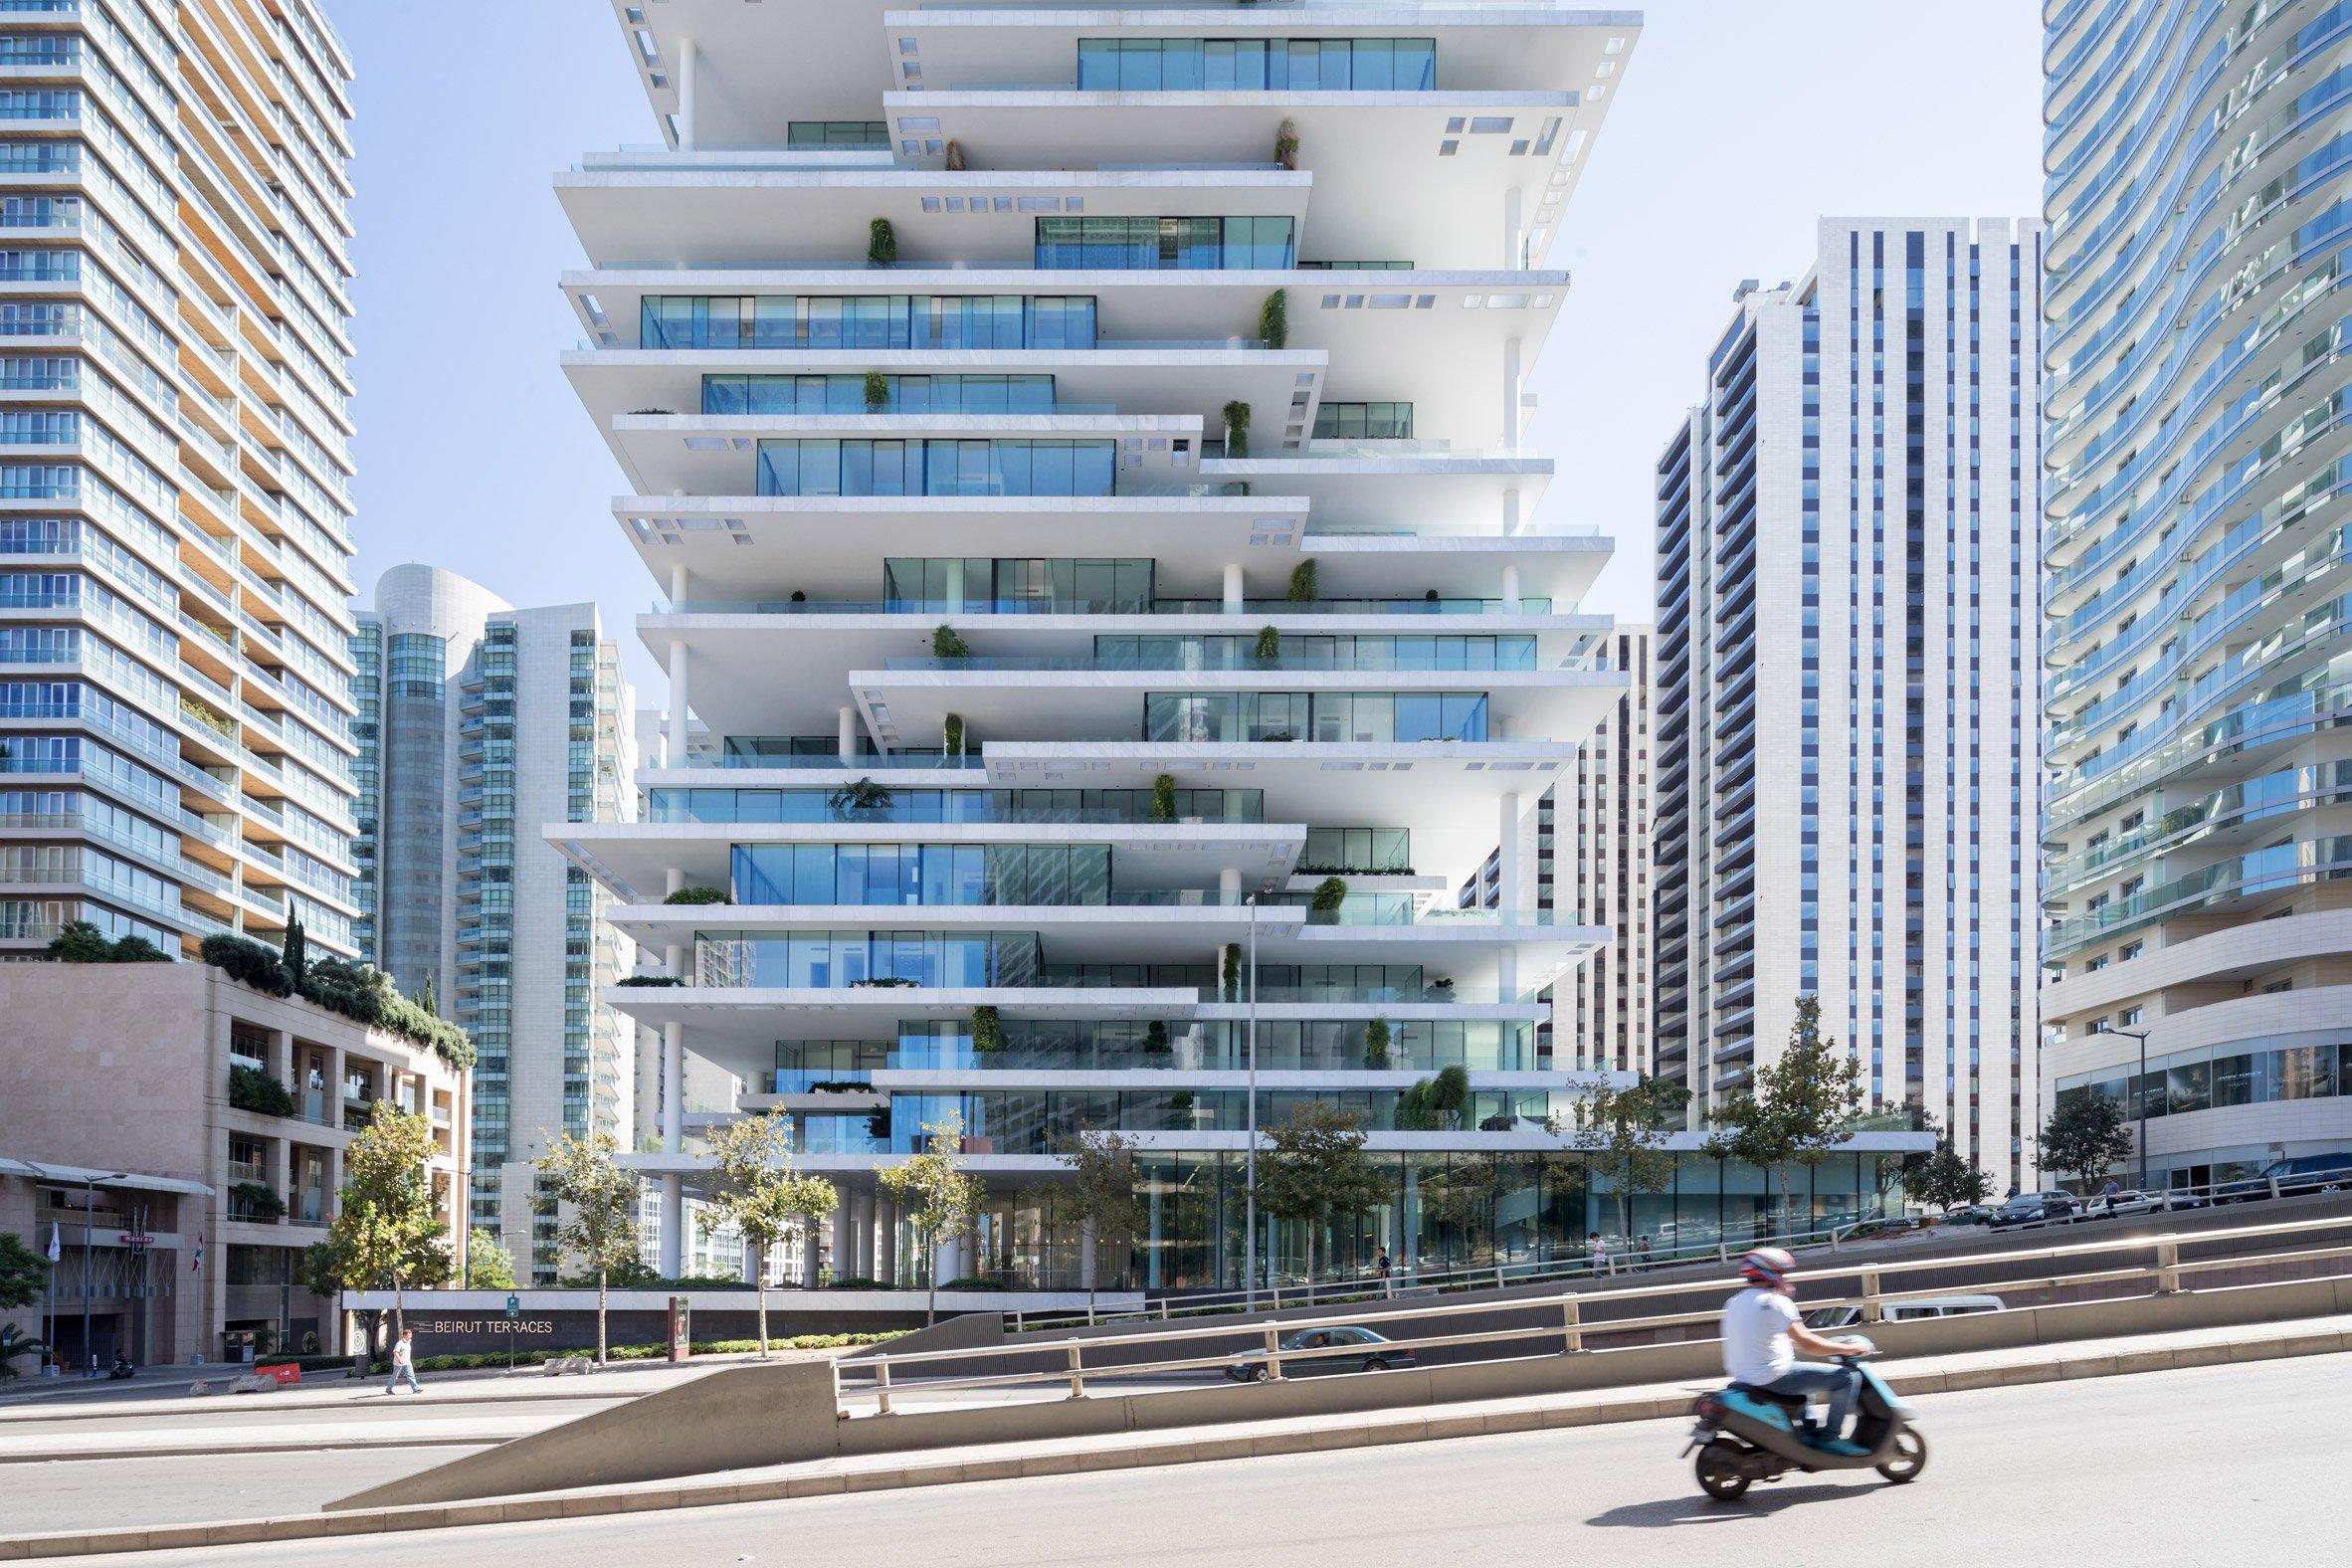 Beirut Terraces